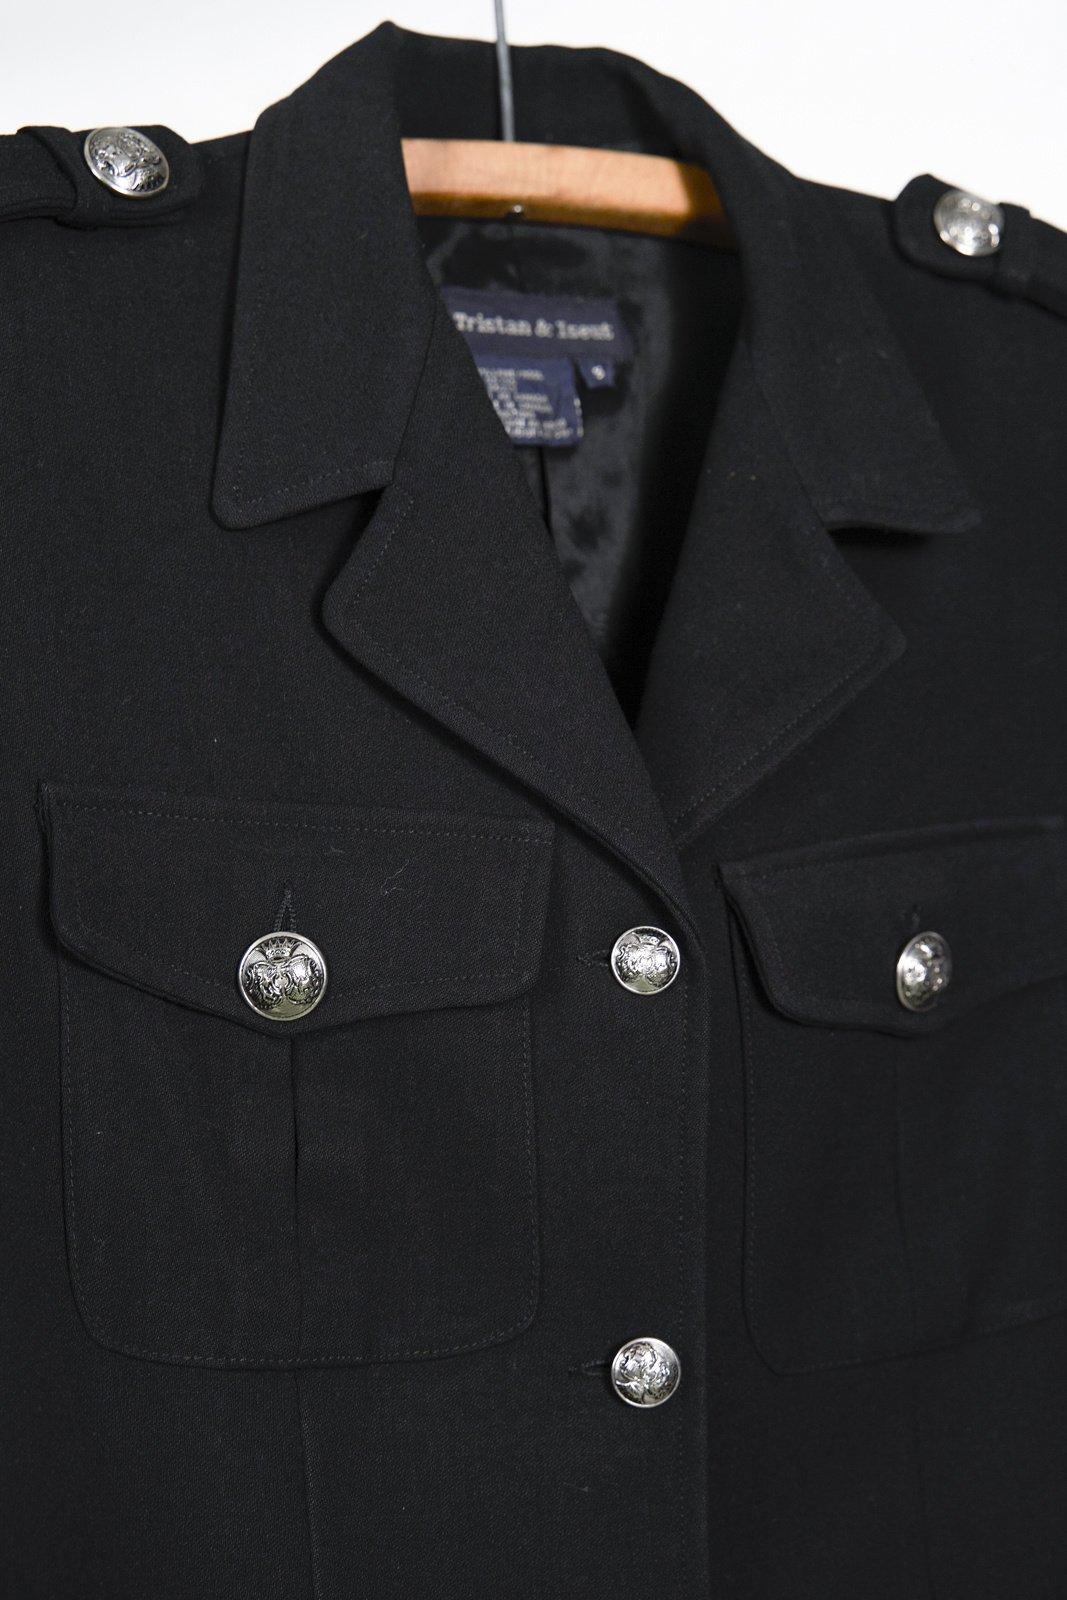 Black Military Tristan Jacket